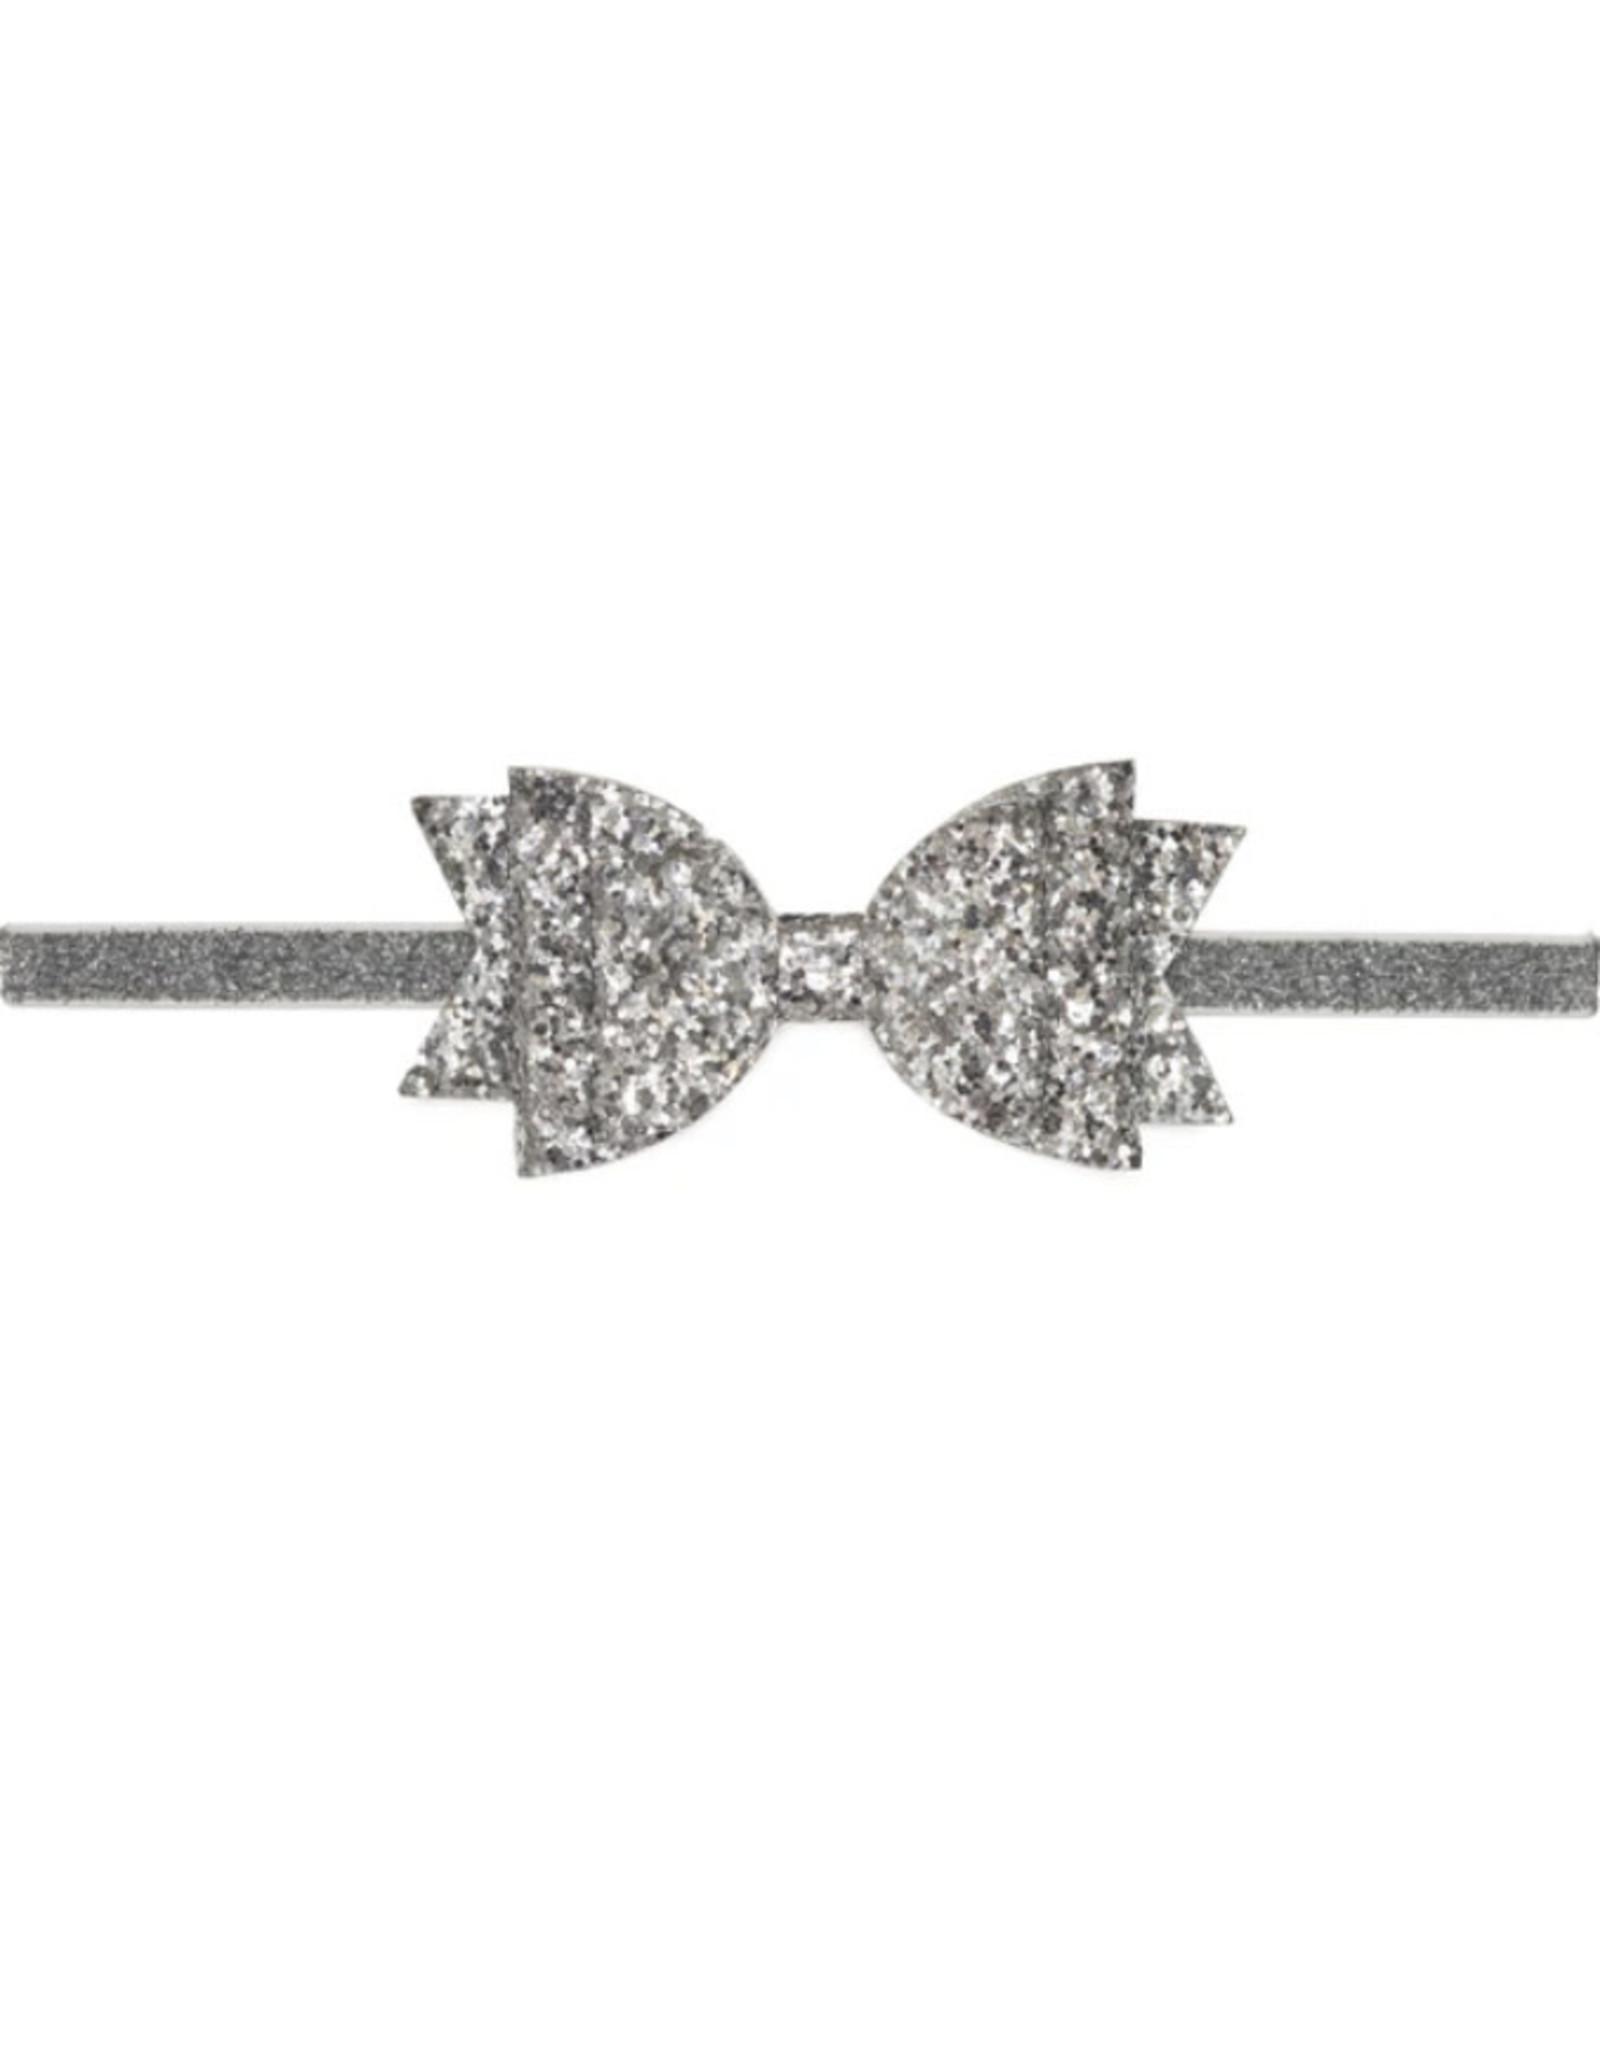 Sweet Wink- Silver Glitter Bow Soft Headband